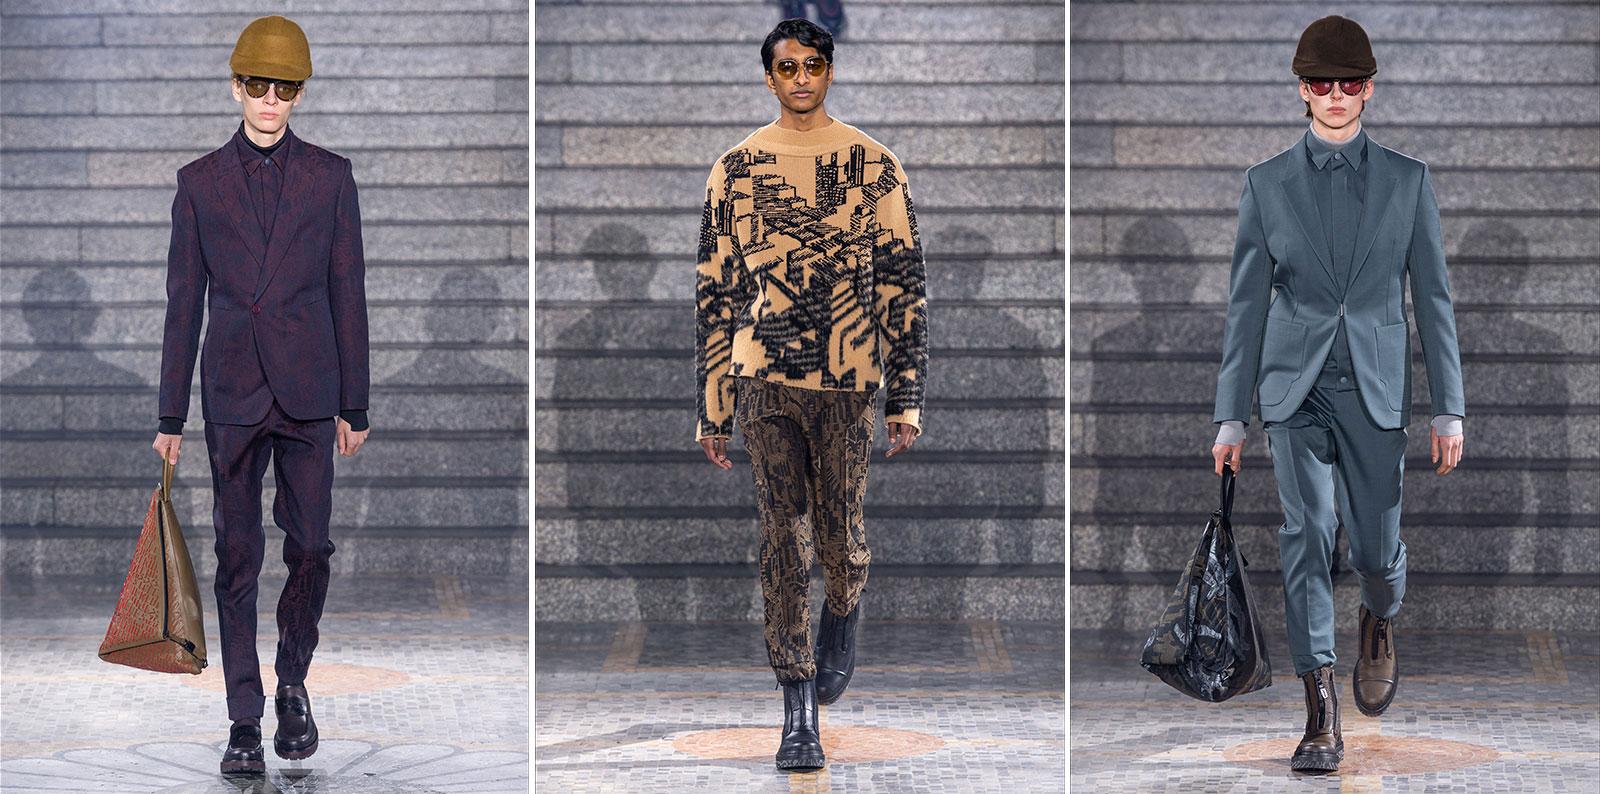 Settimana della moda Milano Ermenegildo Zegna FW 2019 / 2020